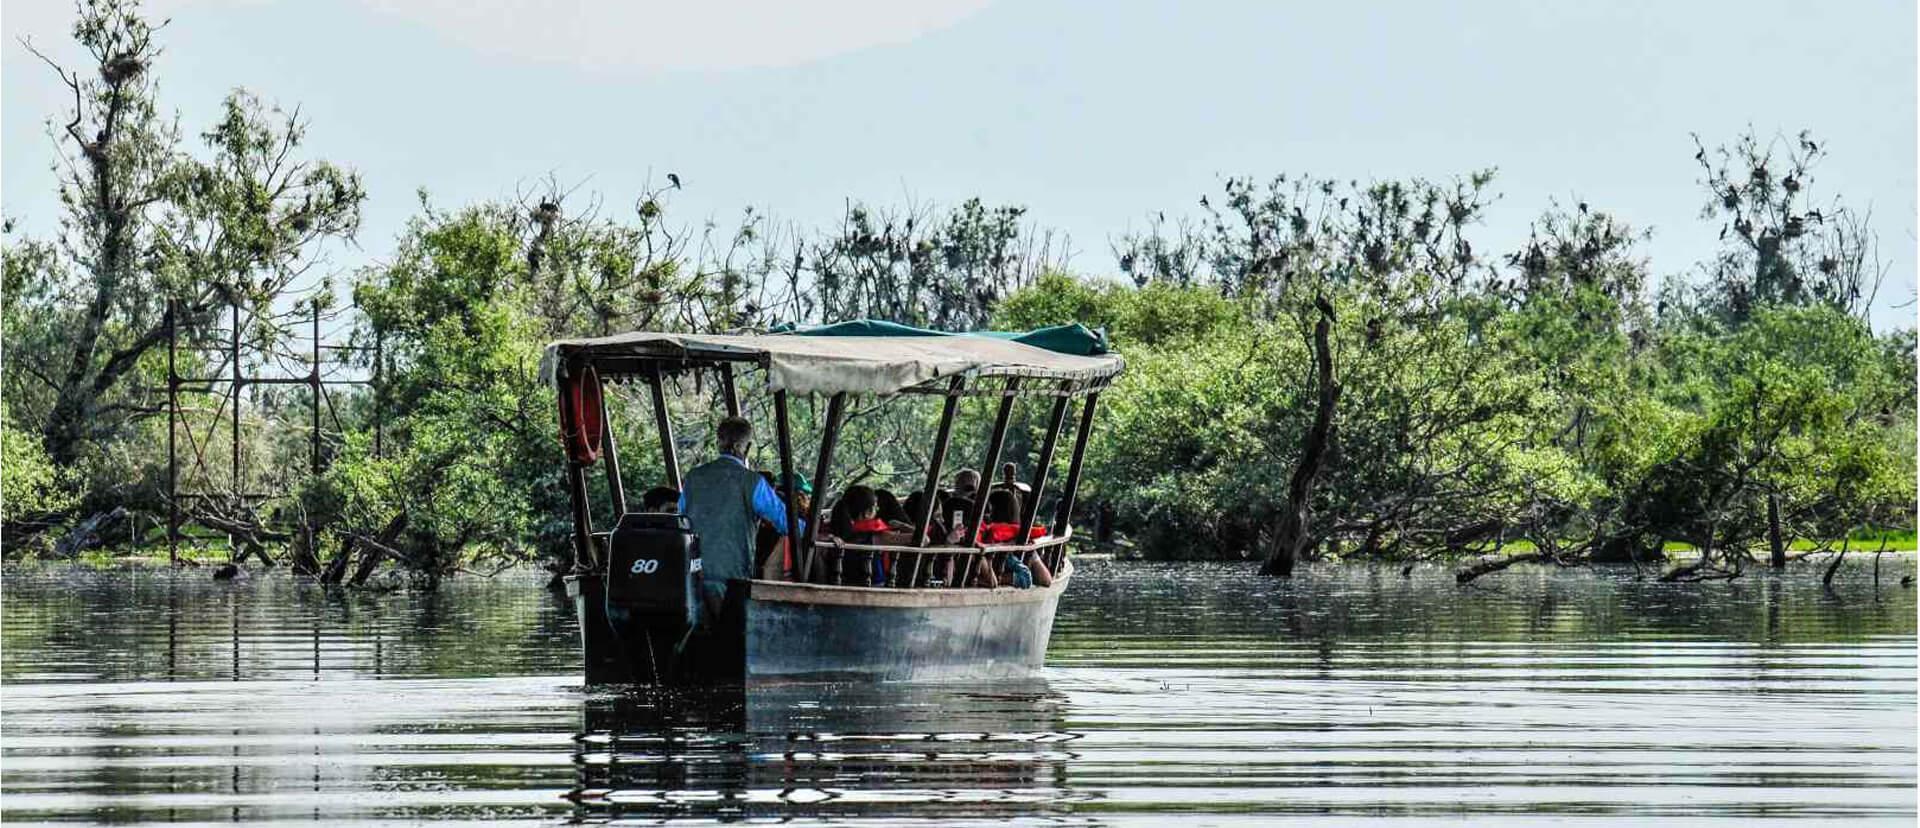 Kerkini Lake: Boating and Horse Riding Experience